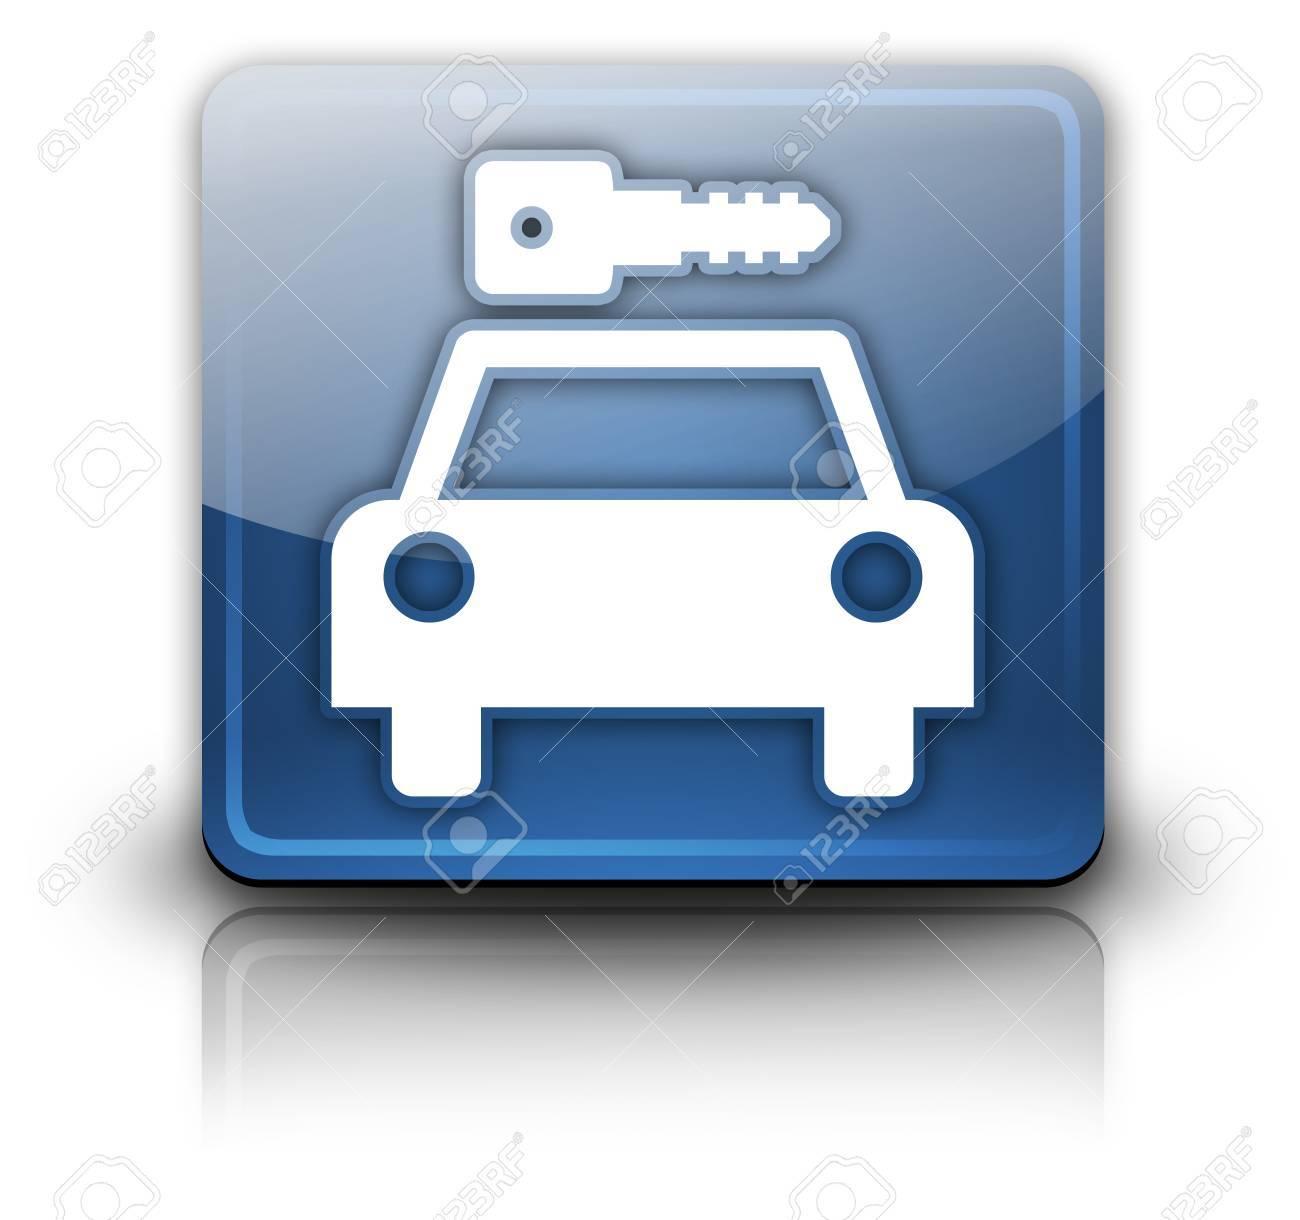 Icon, Button, Pictogram with Car Rental symbol Stock Photo - 27196183